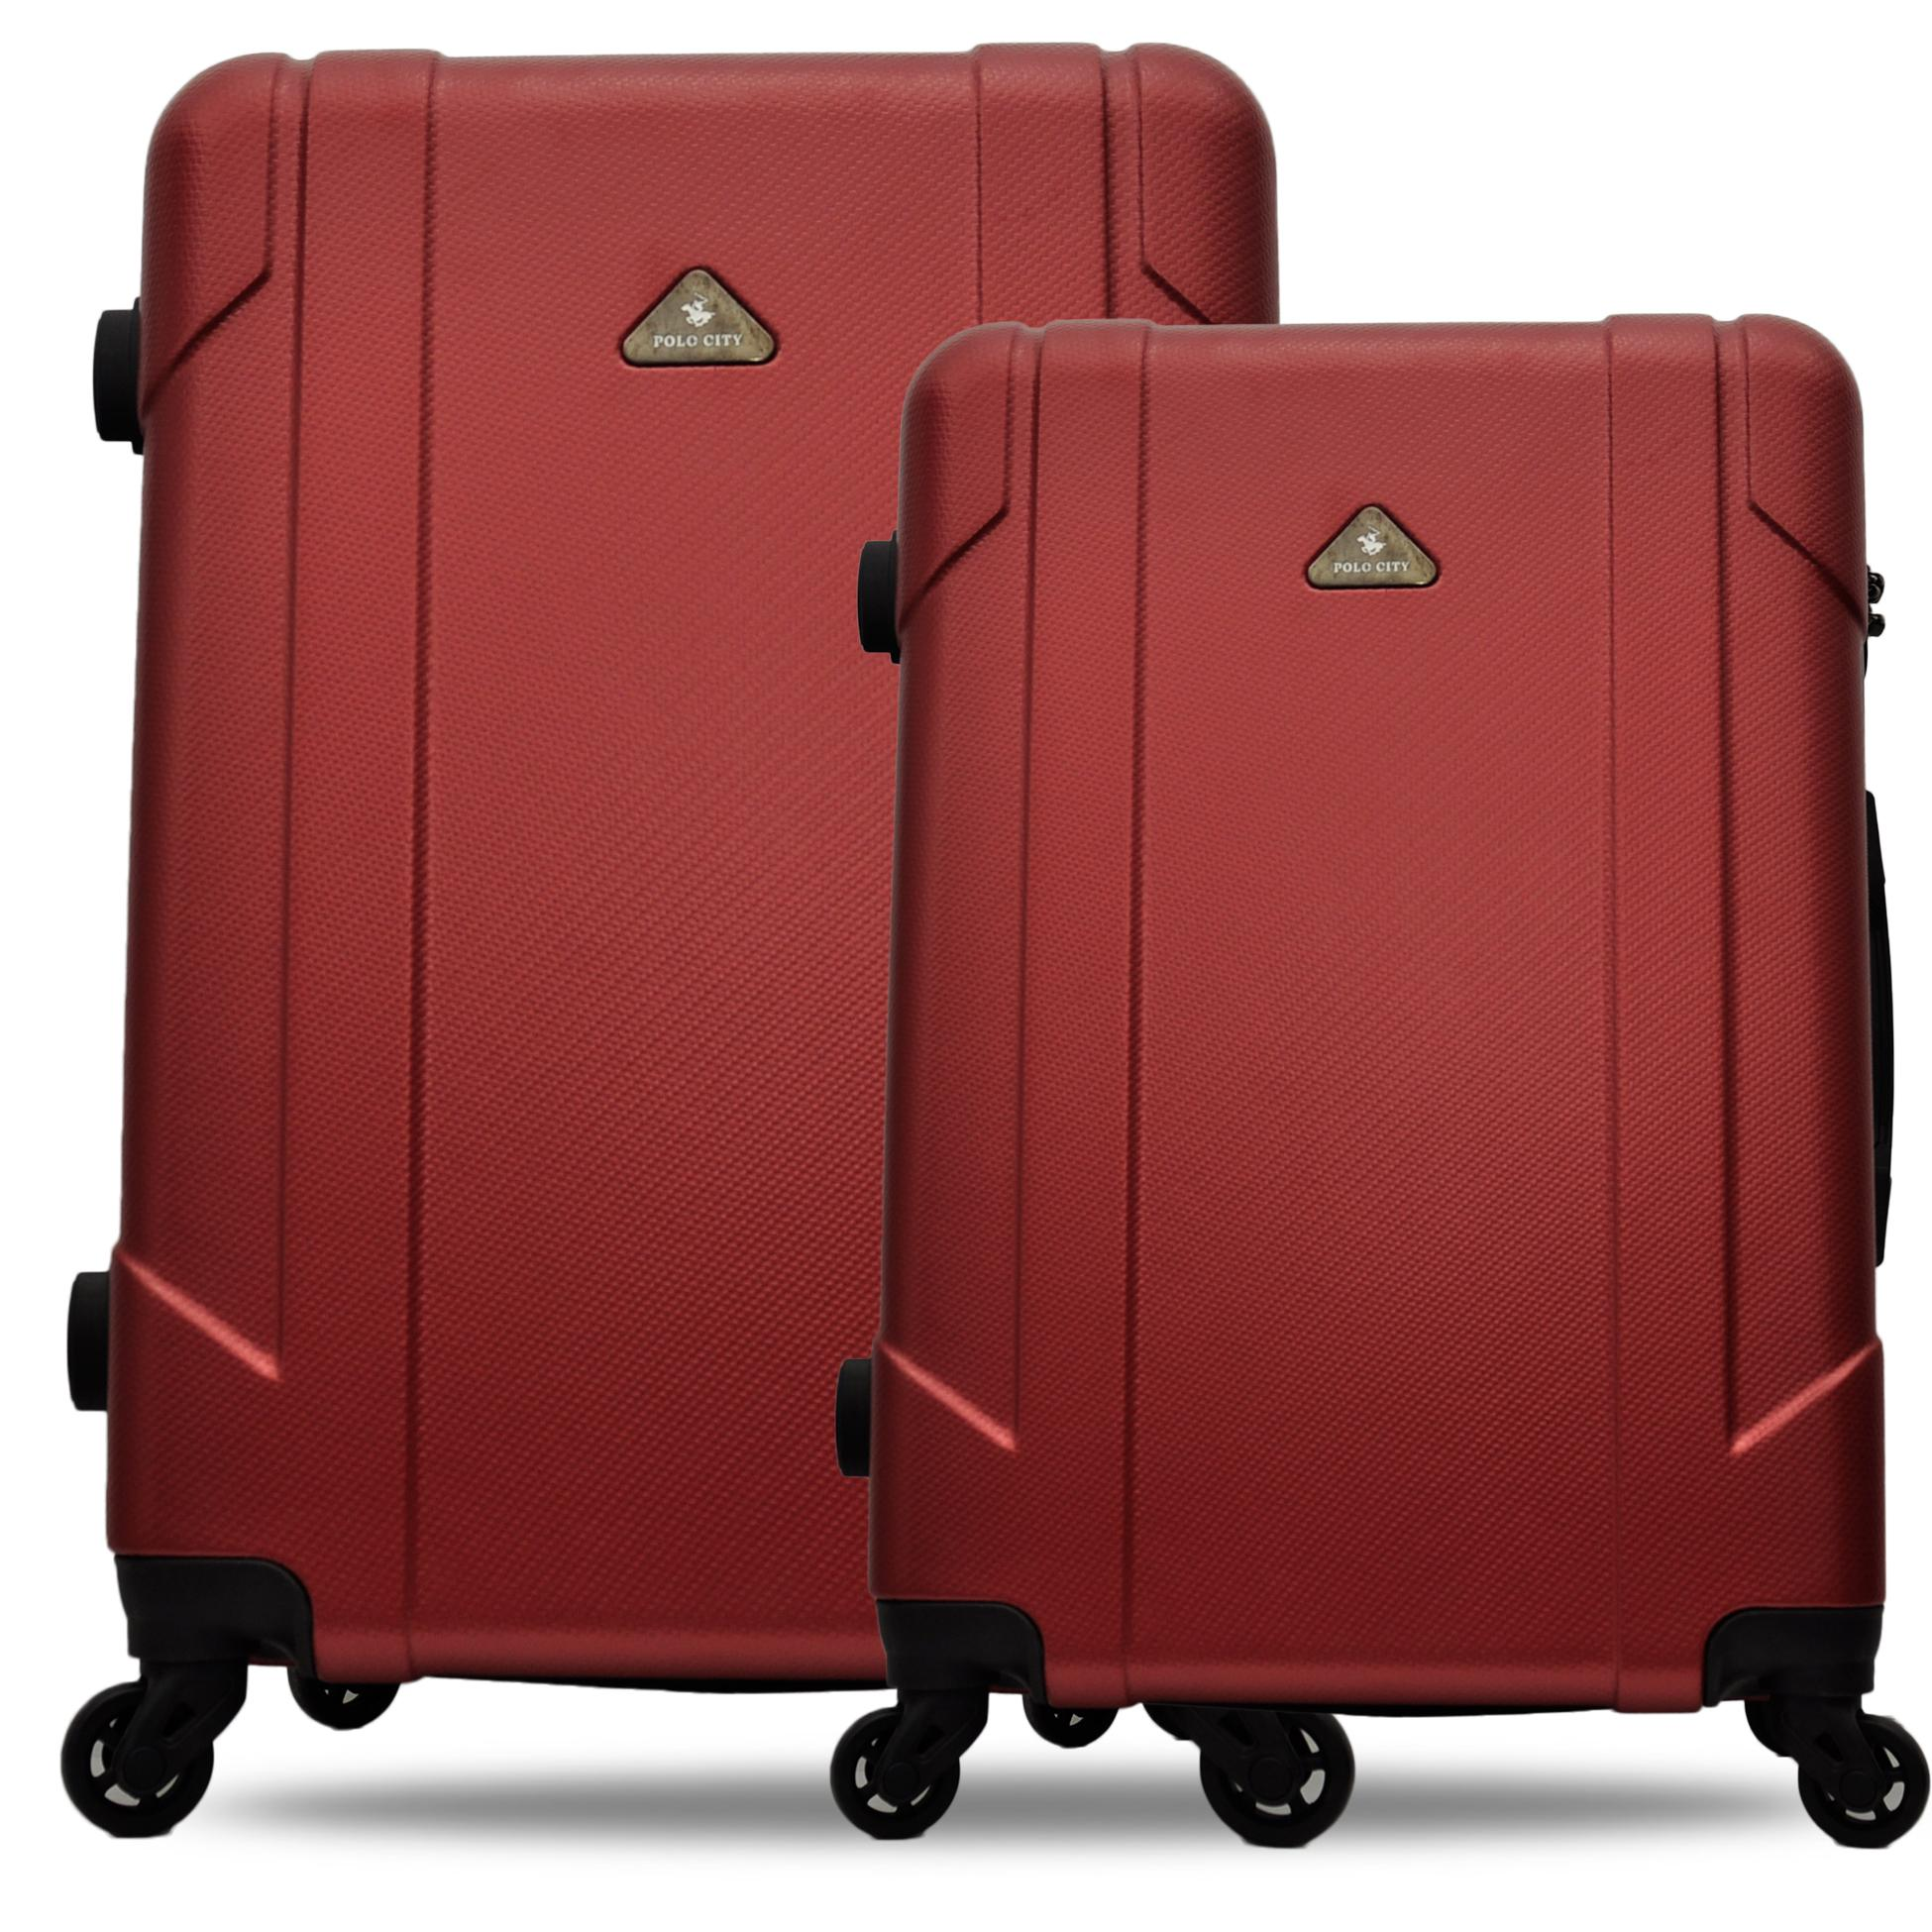 Polo City Tas Koper Hardcase SET size 20+24 inch - 303 69aa998785